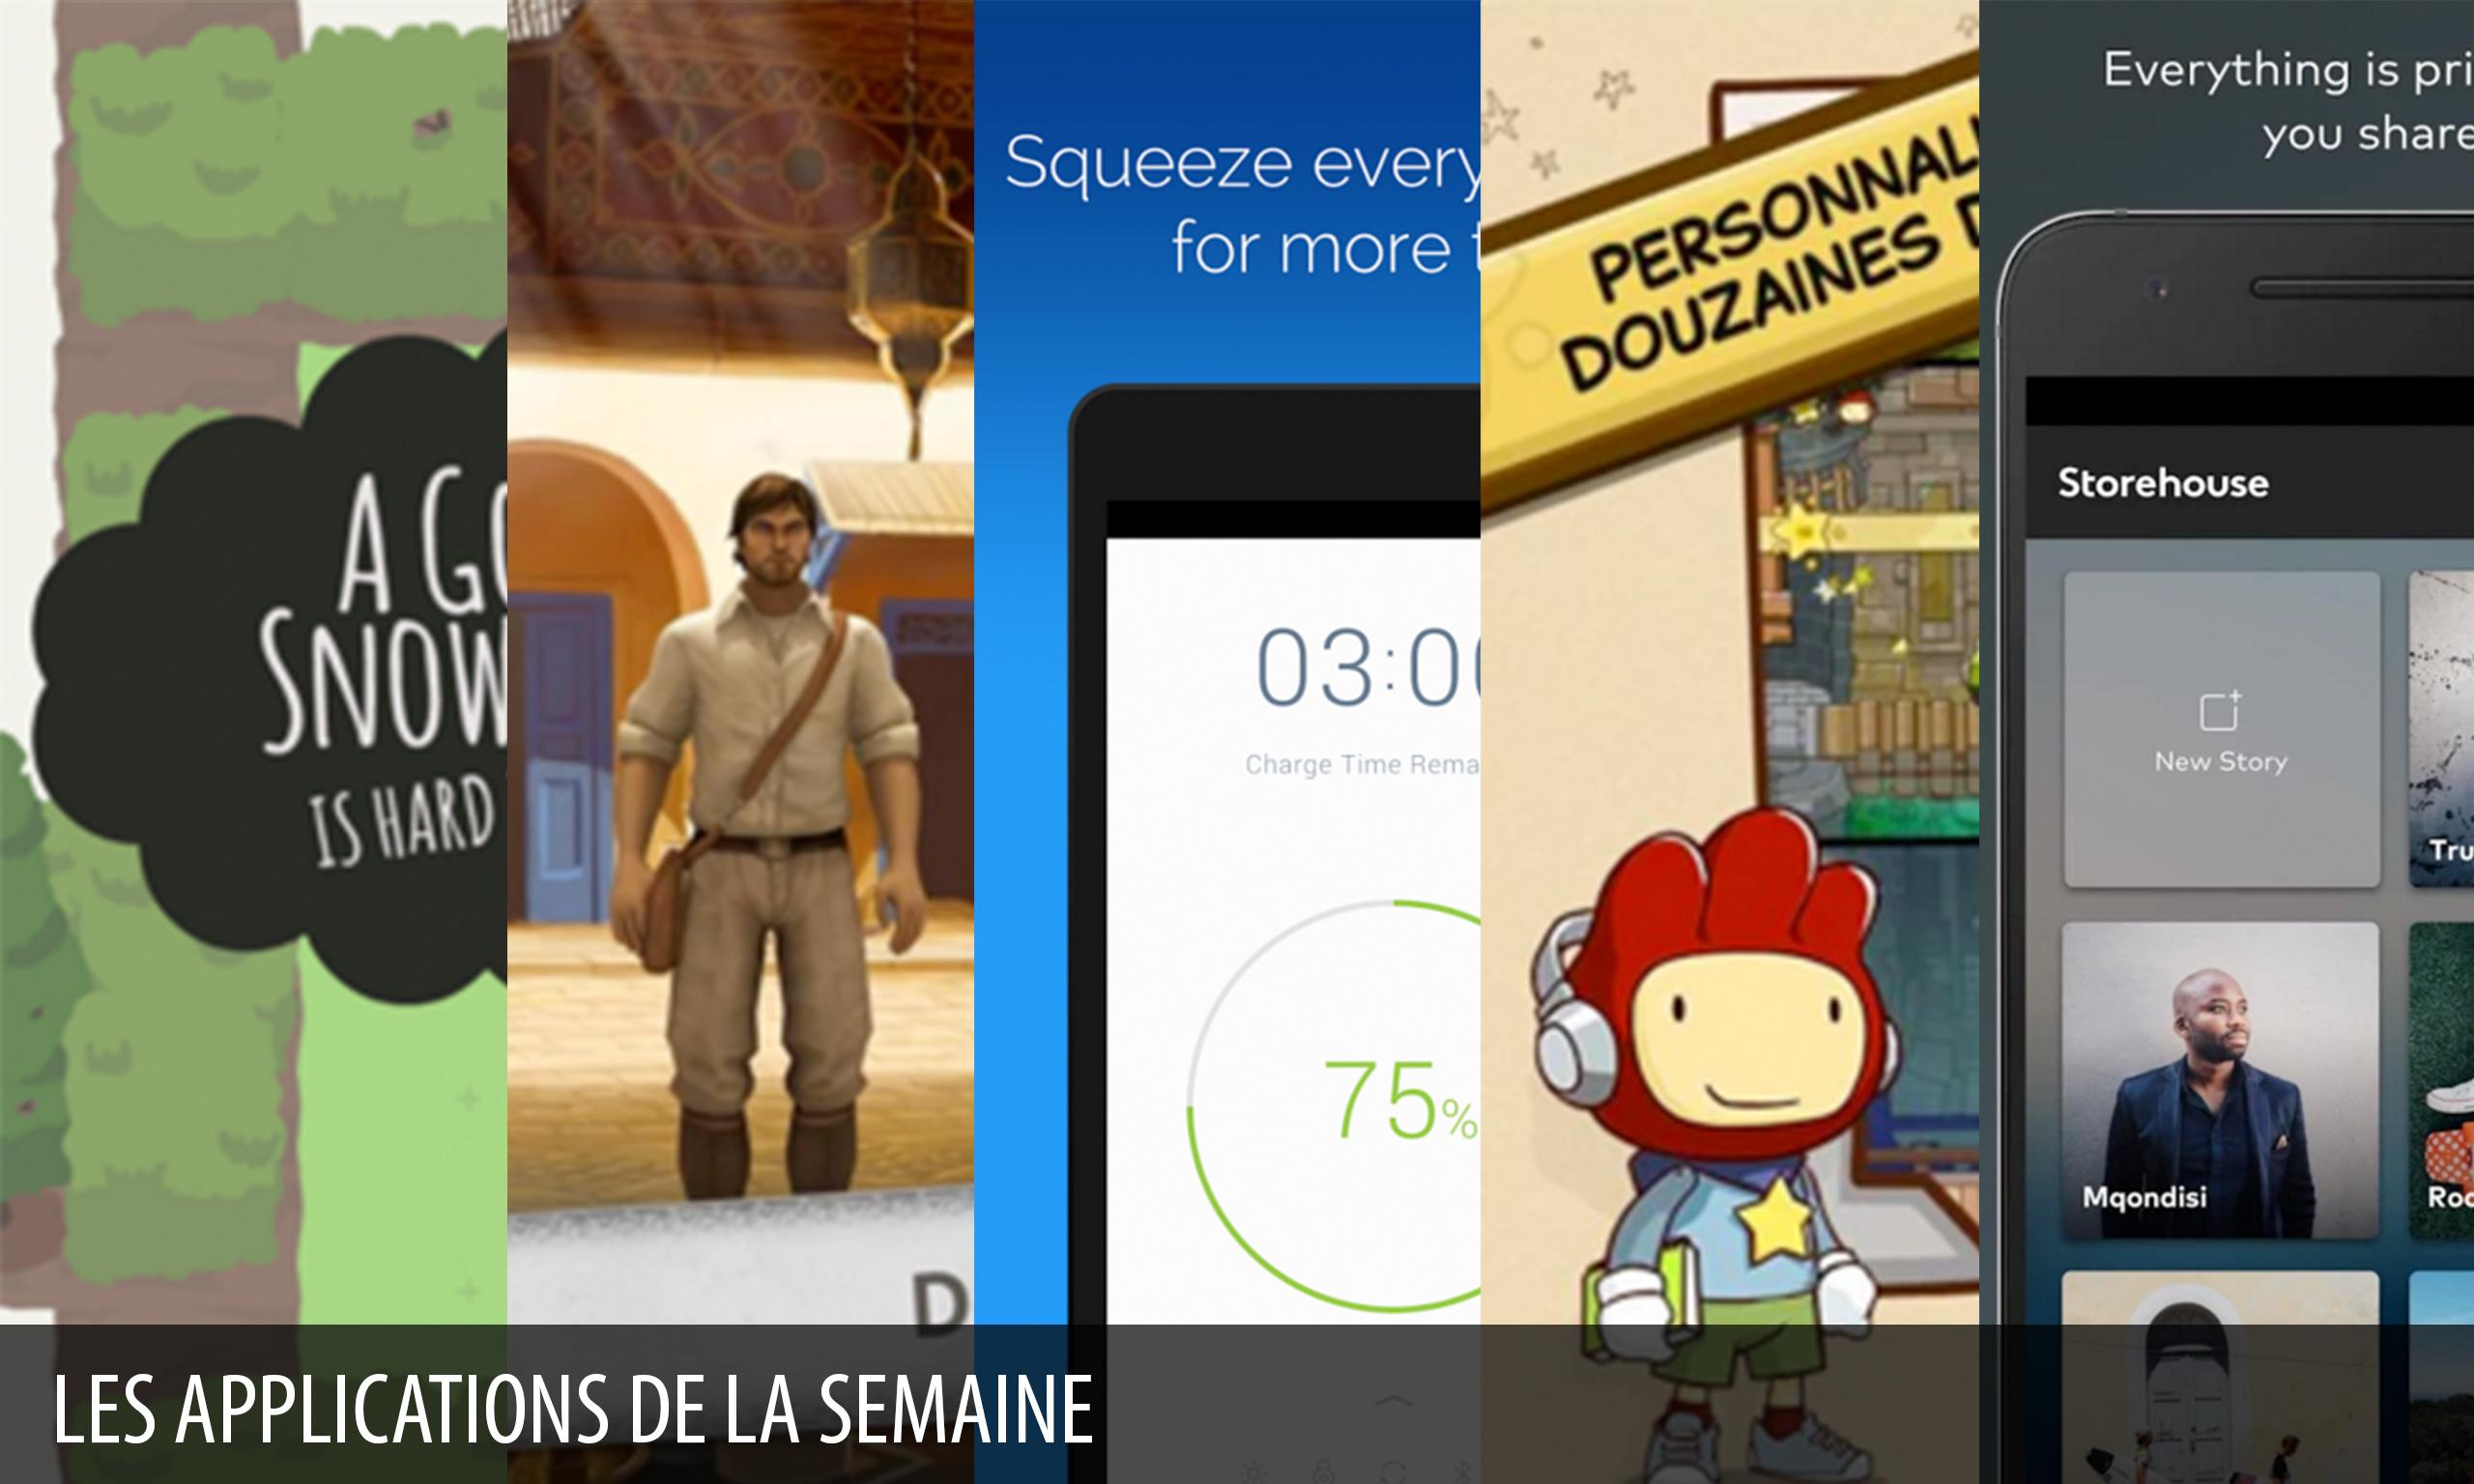 Les apps de la semaine : Scribblenauts Unlimited, A Good Snowman…